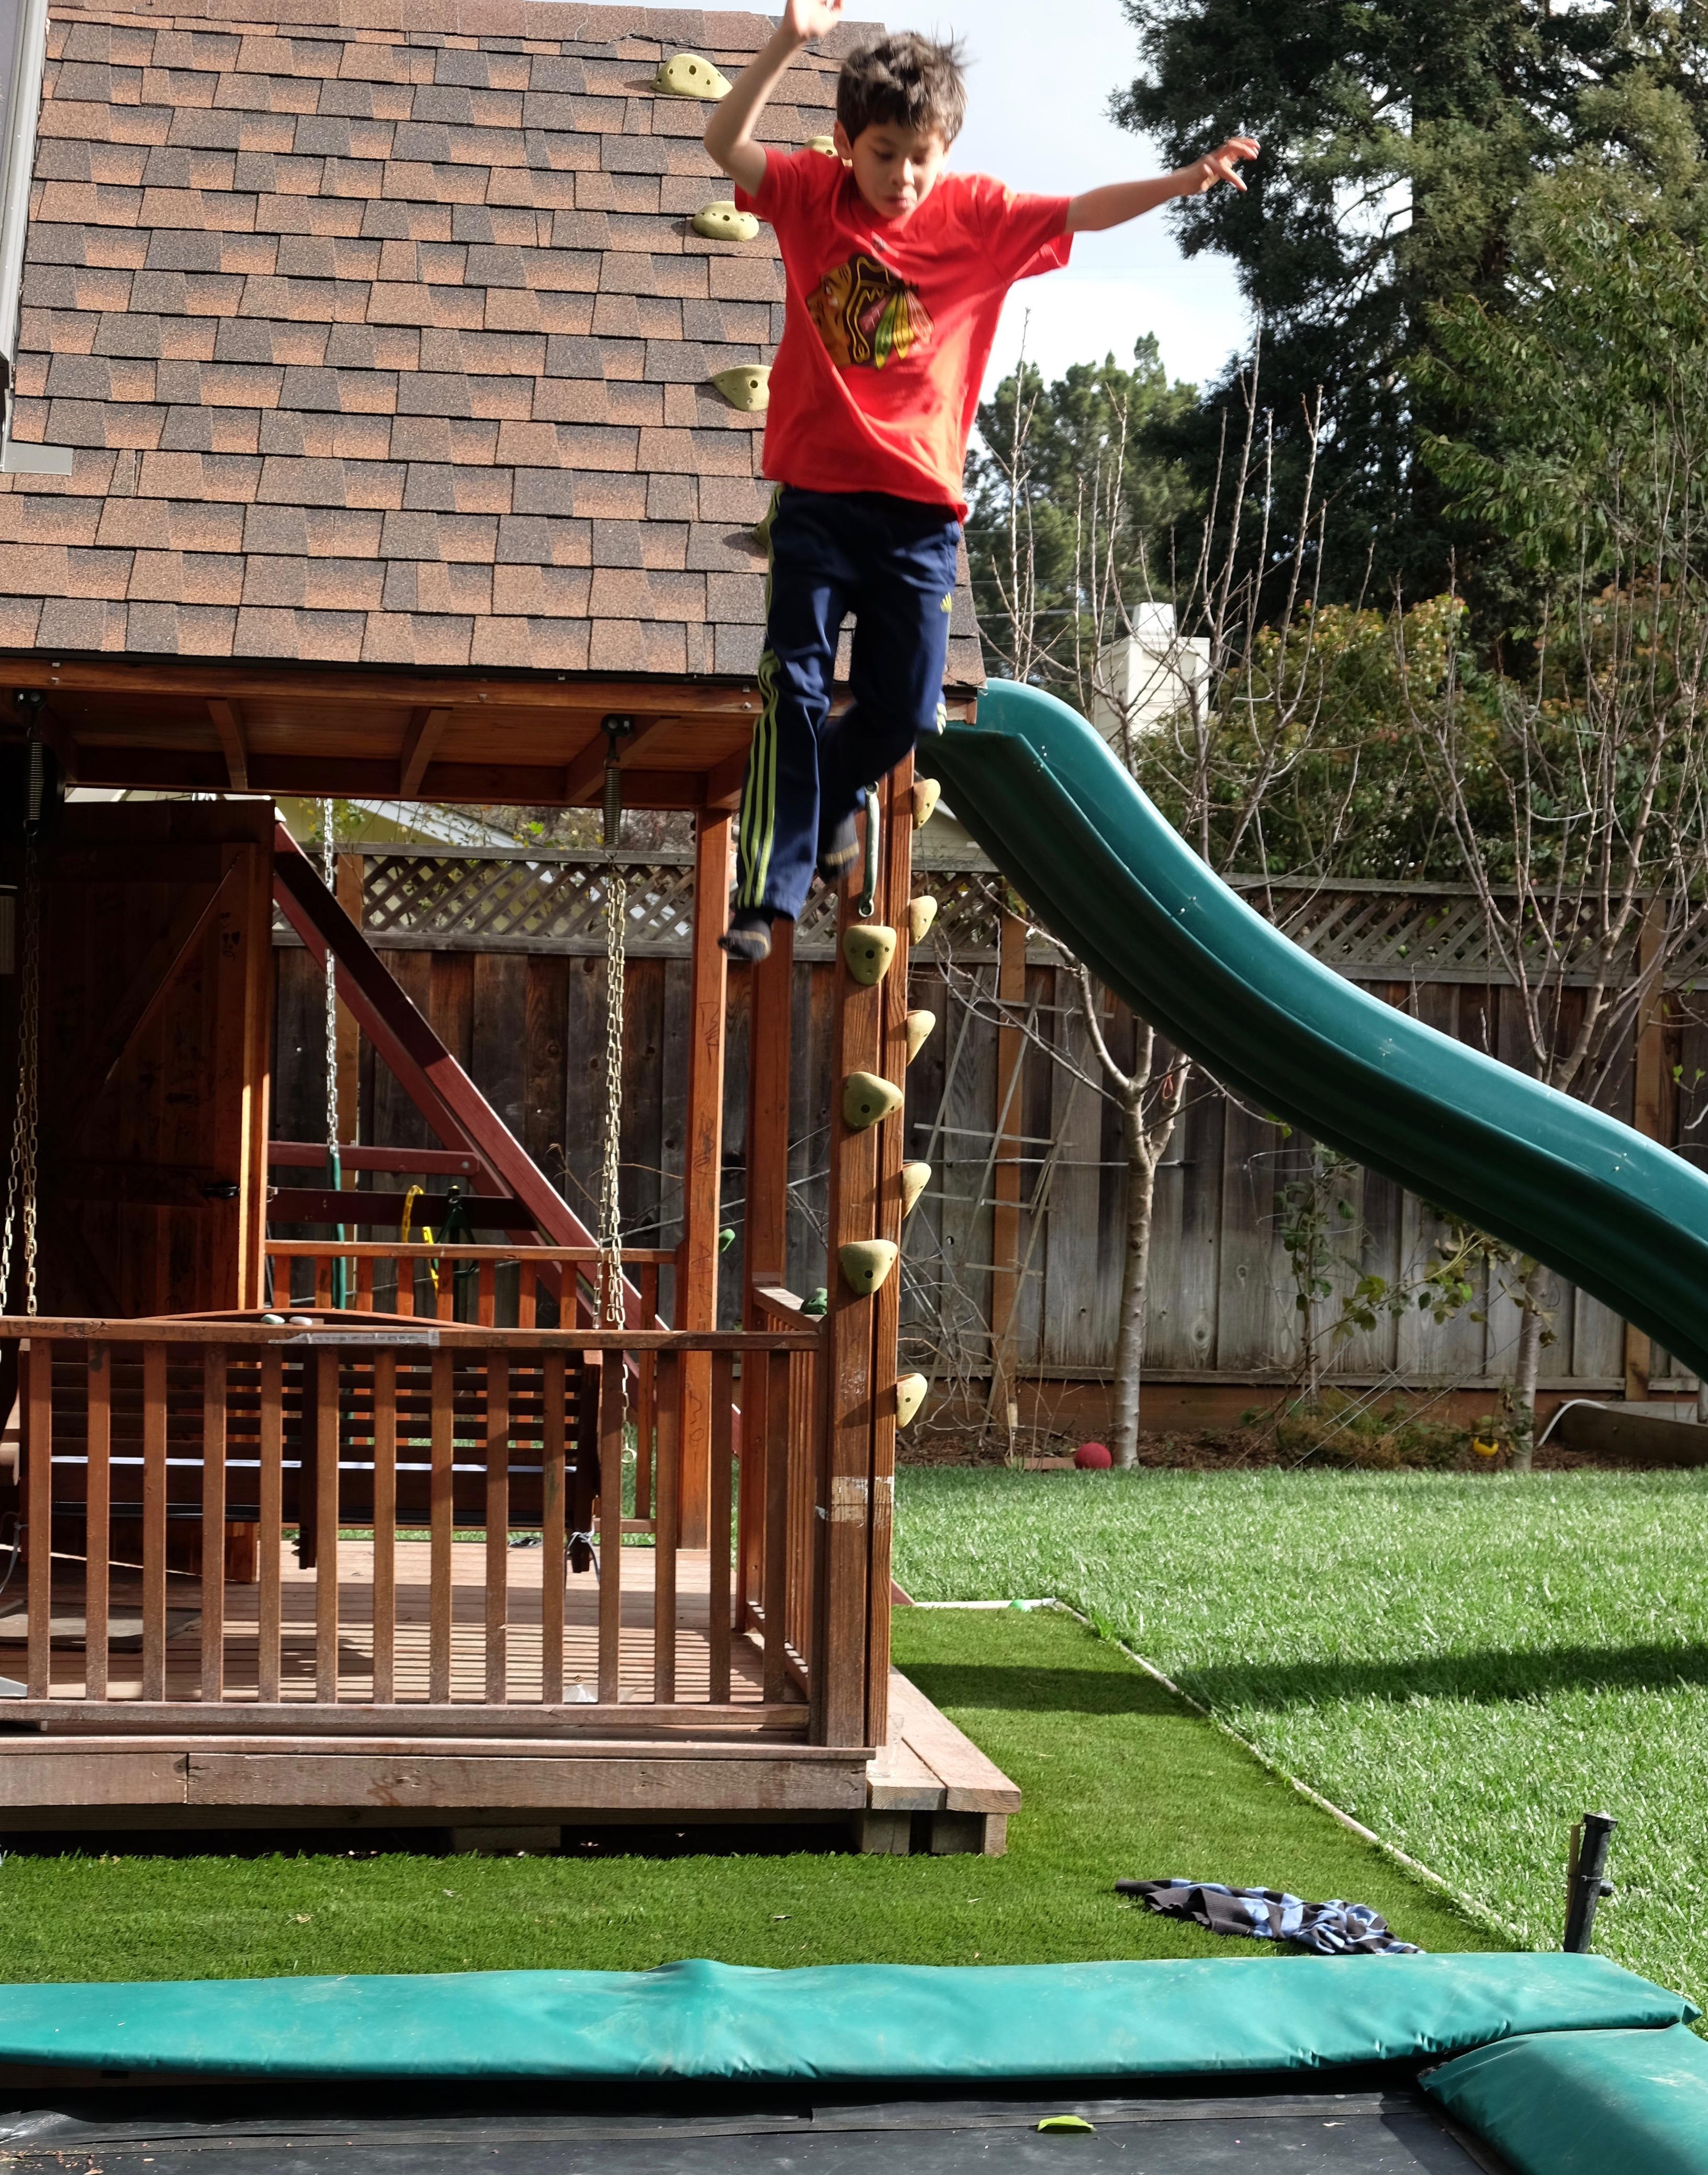 e Man s Way to Create Neighborhood Play for His Kids